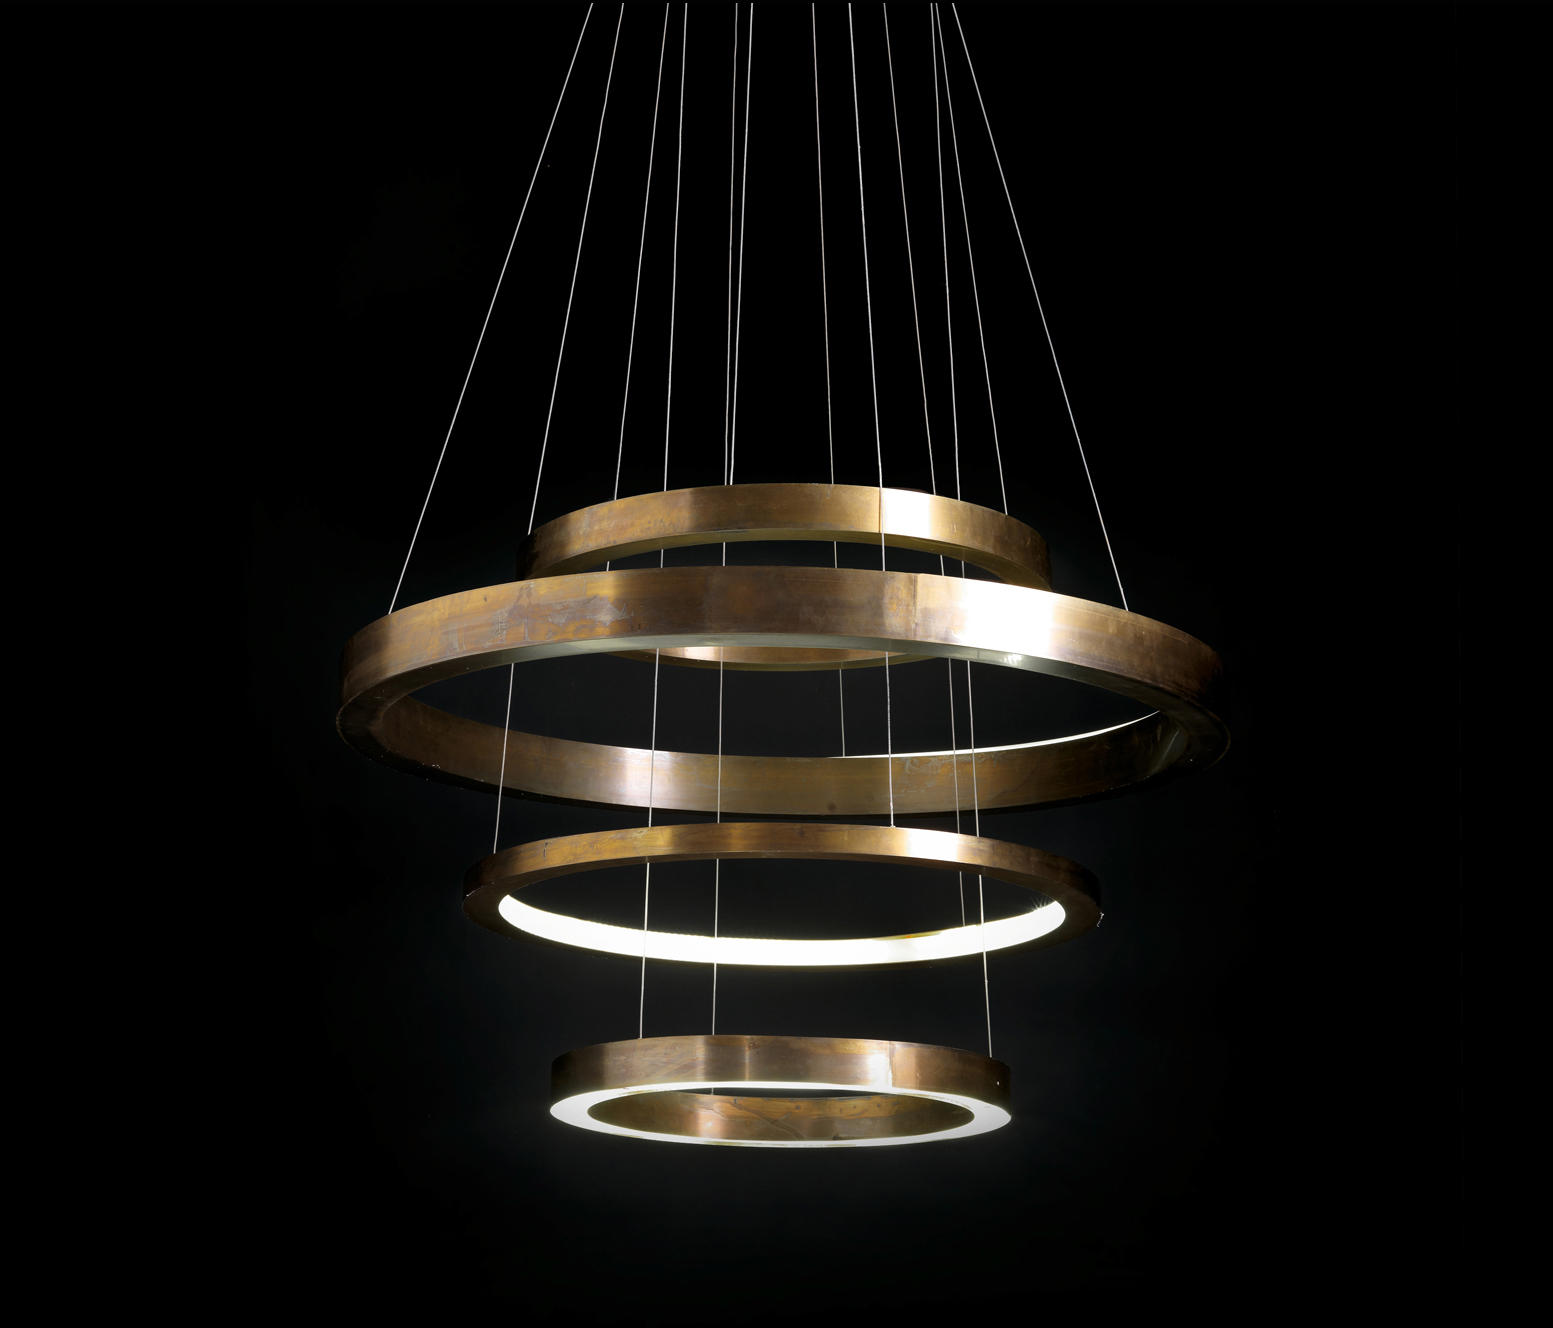 LIGHT RING MAXI - Suspended Lights From HENGE